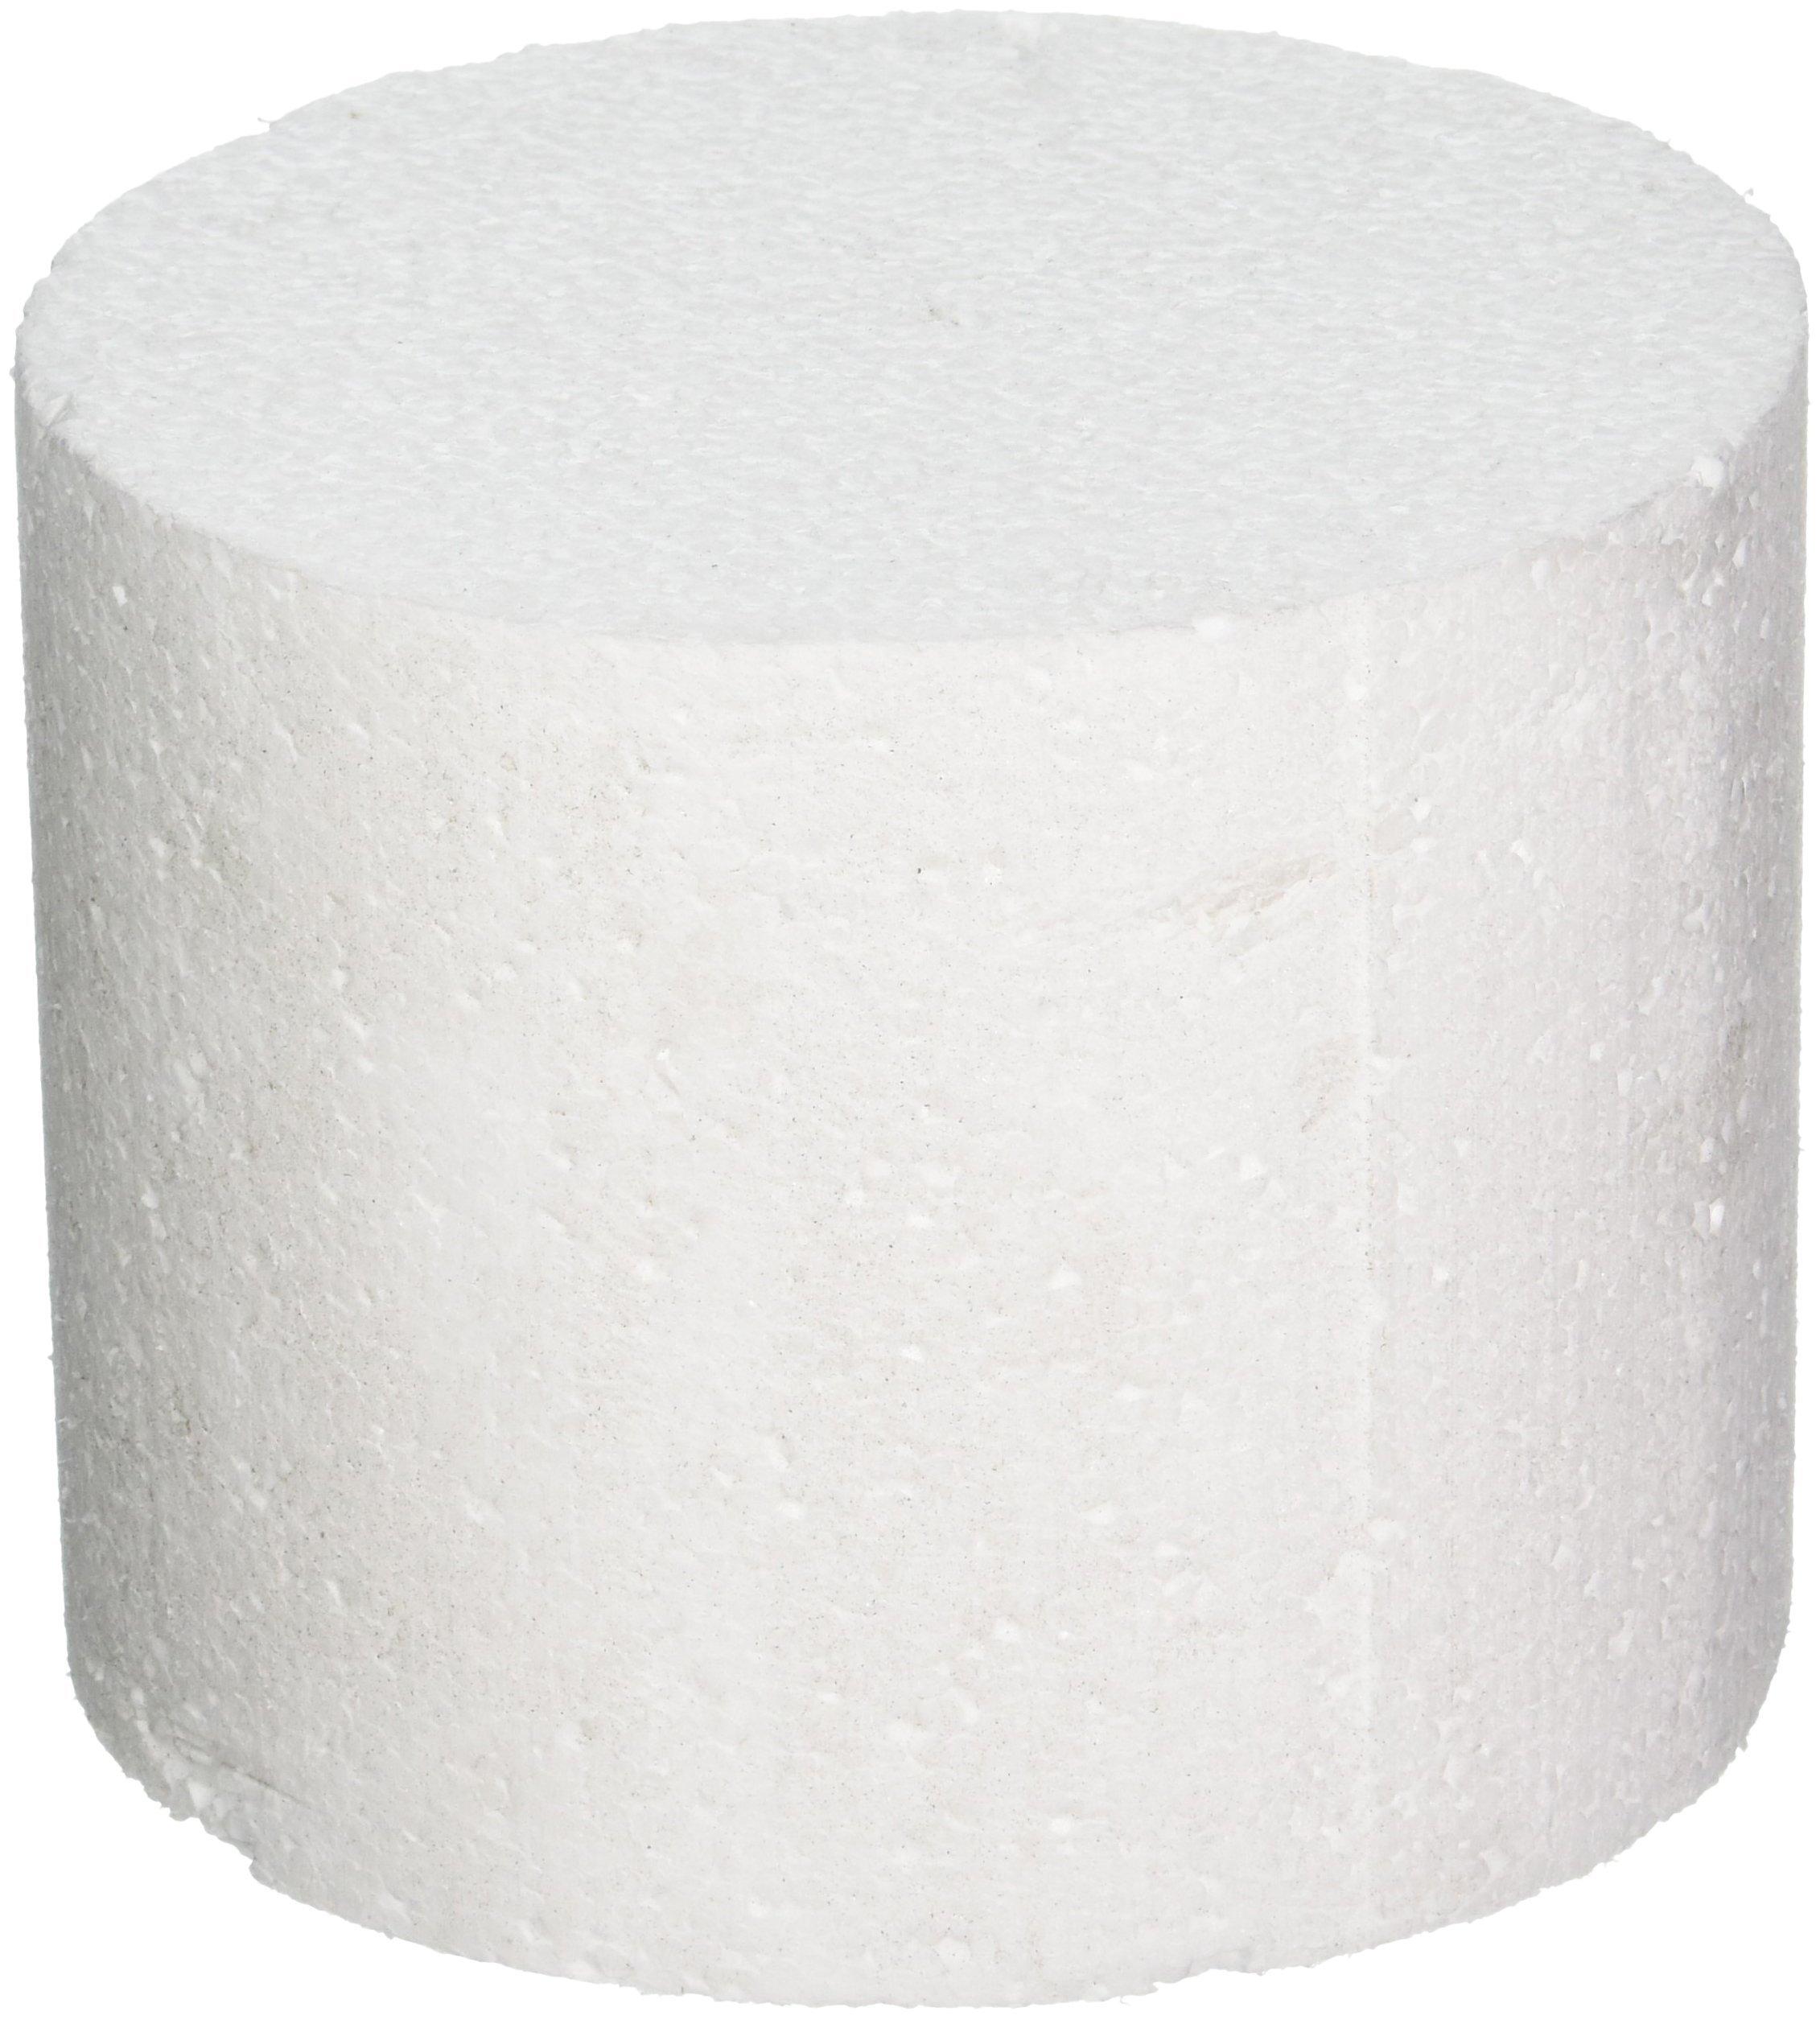 Oasis Supply 747086 Dummy Round Cake, 6'' x 5'', White